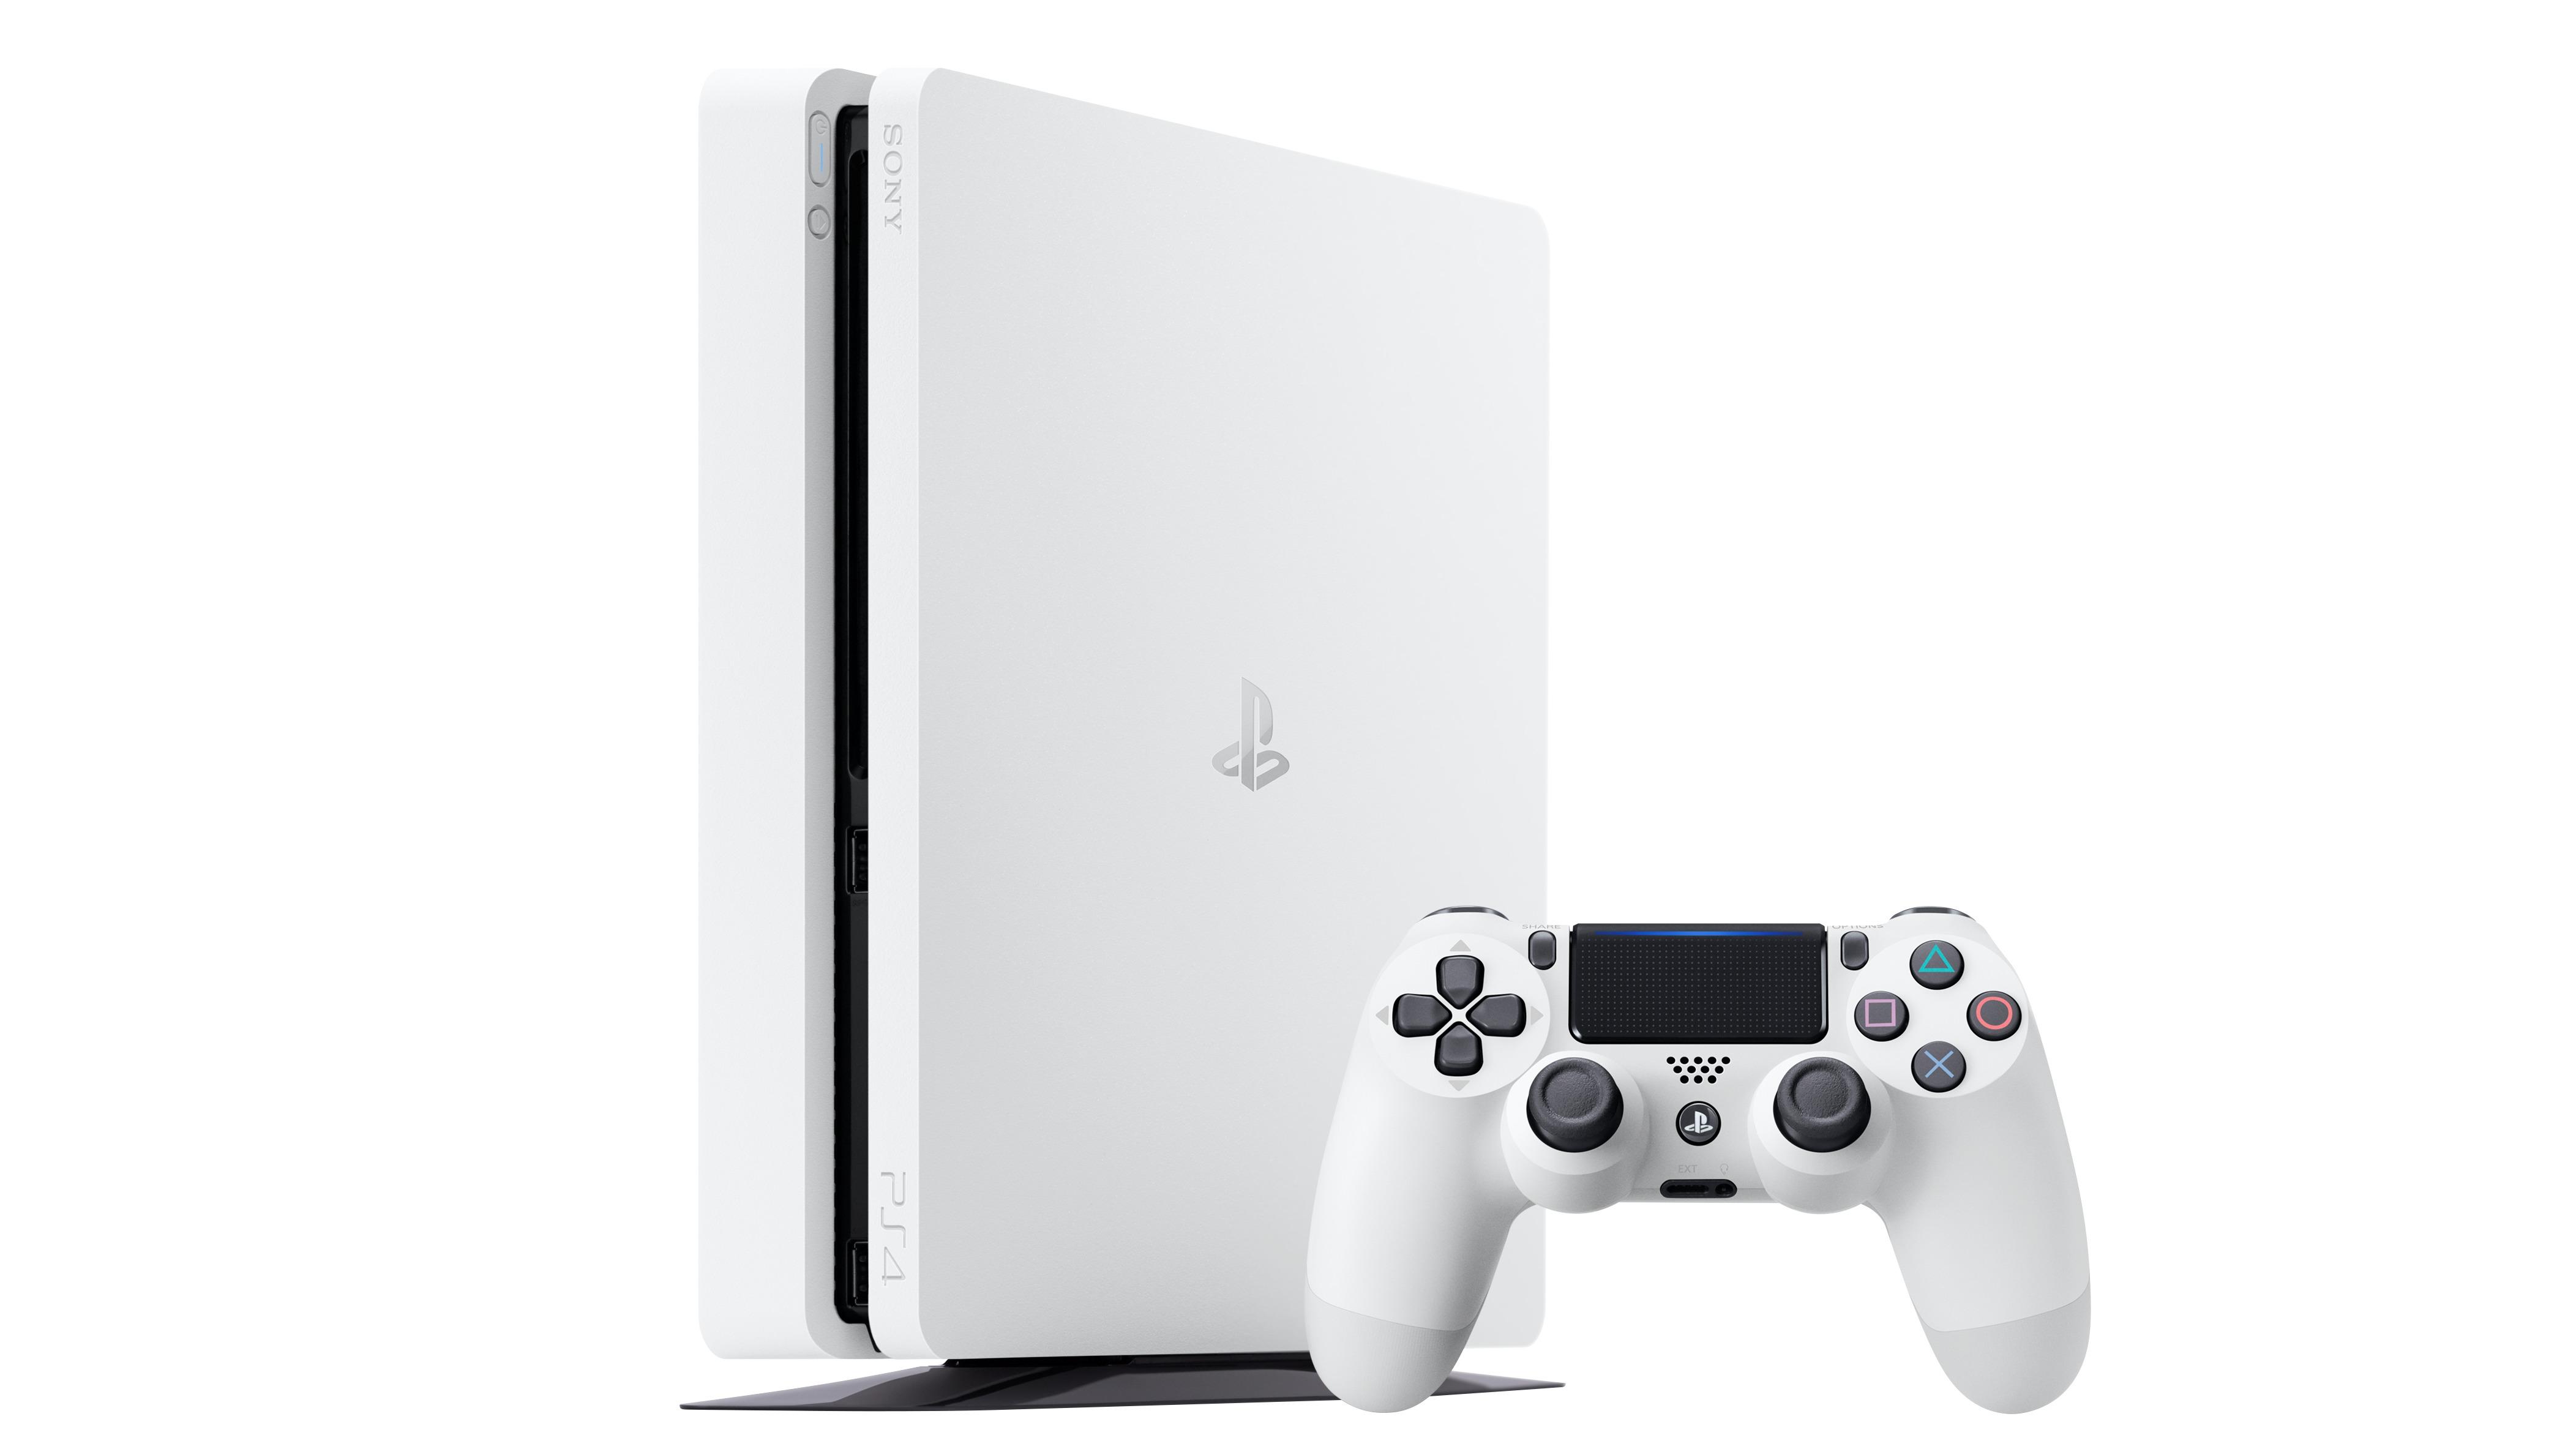 Nå er PlayStation 4 slim også hvit.